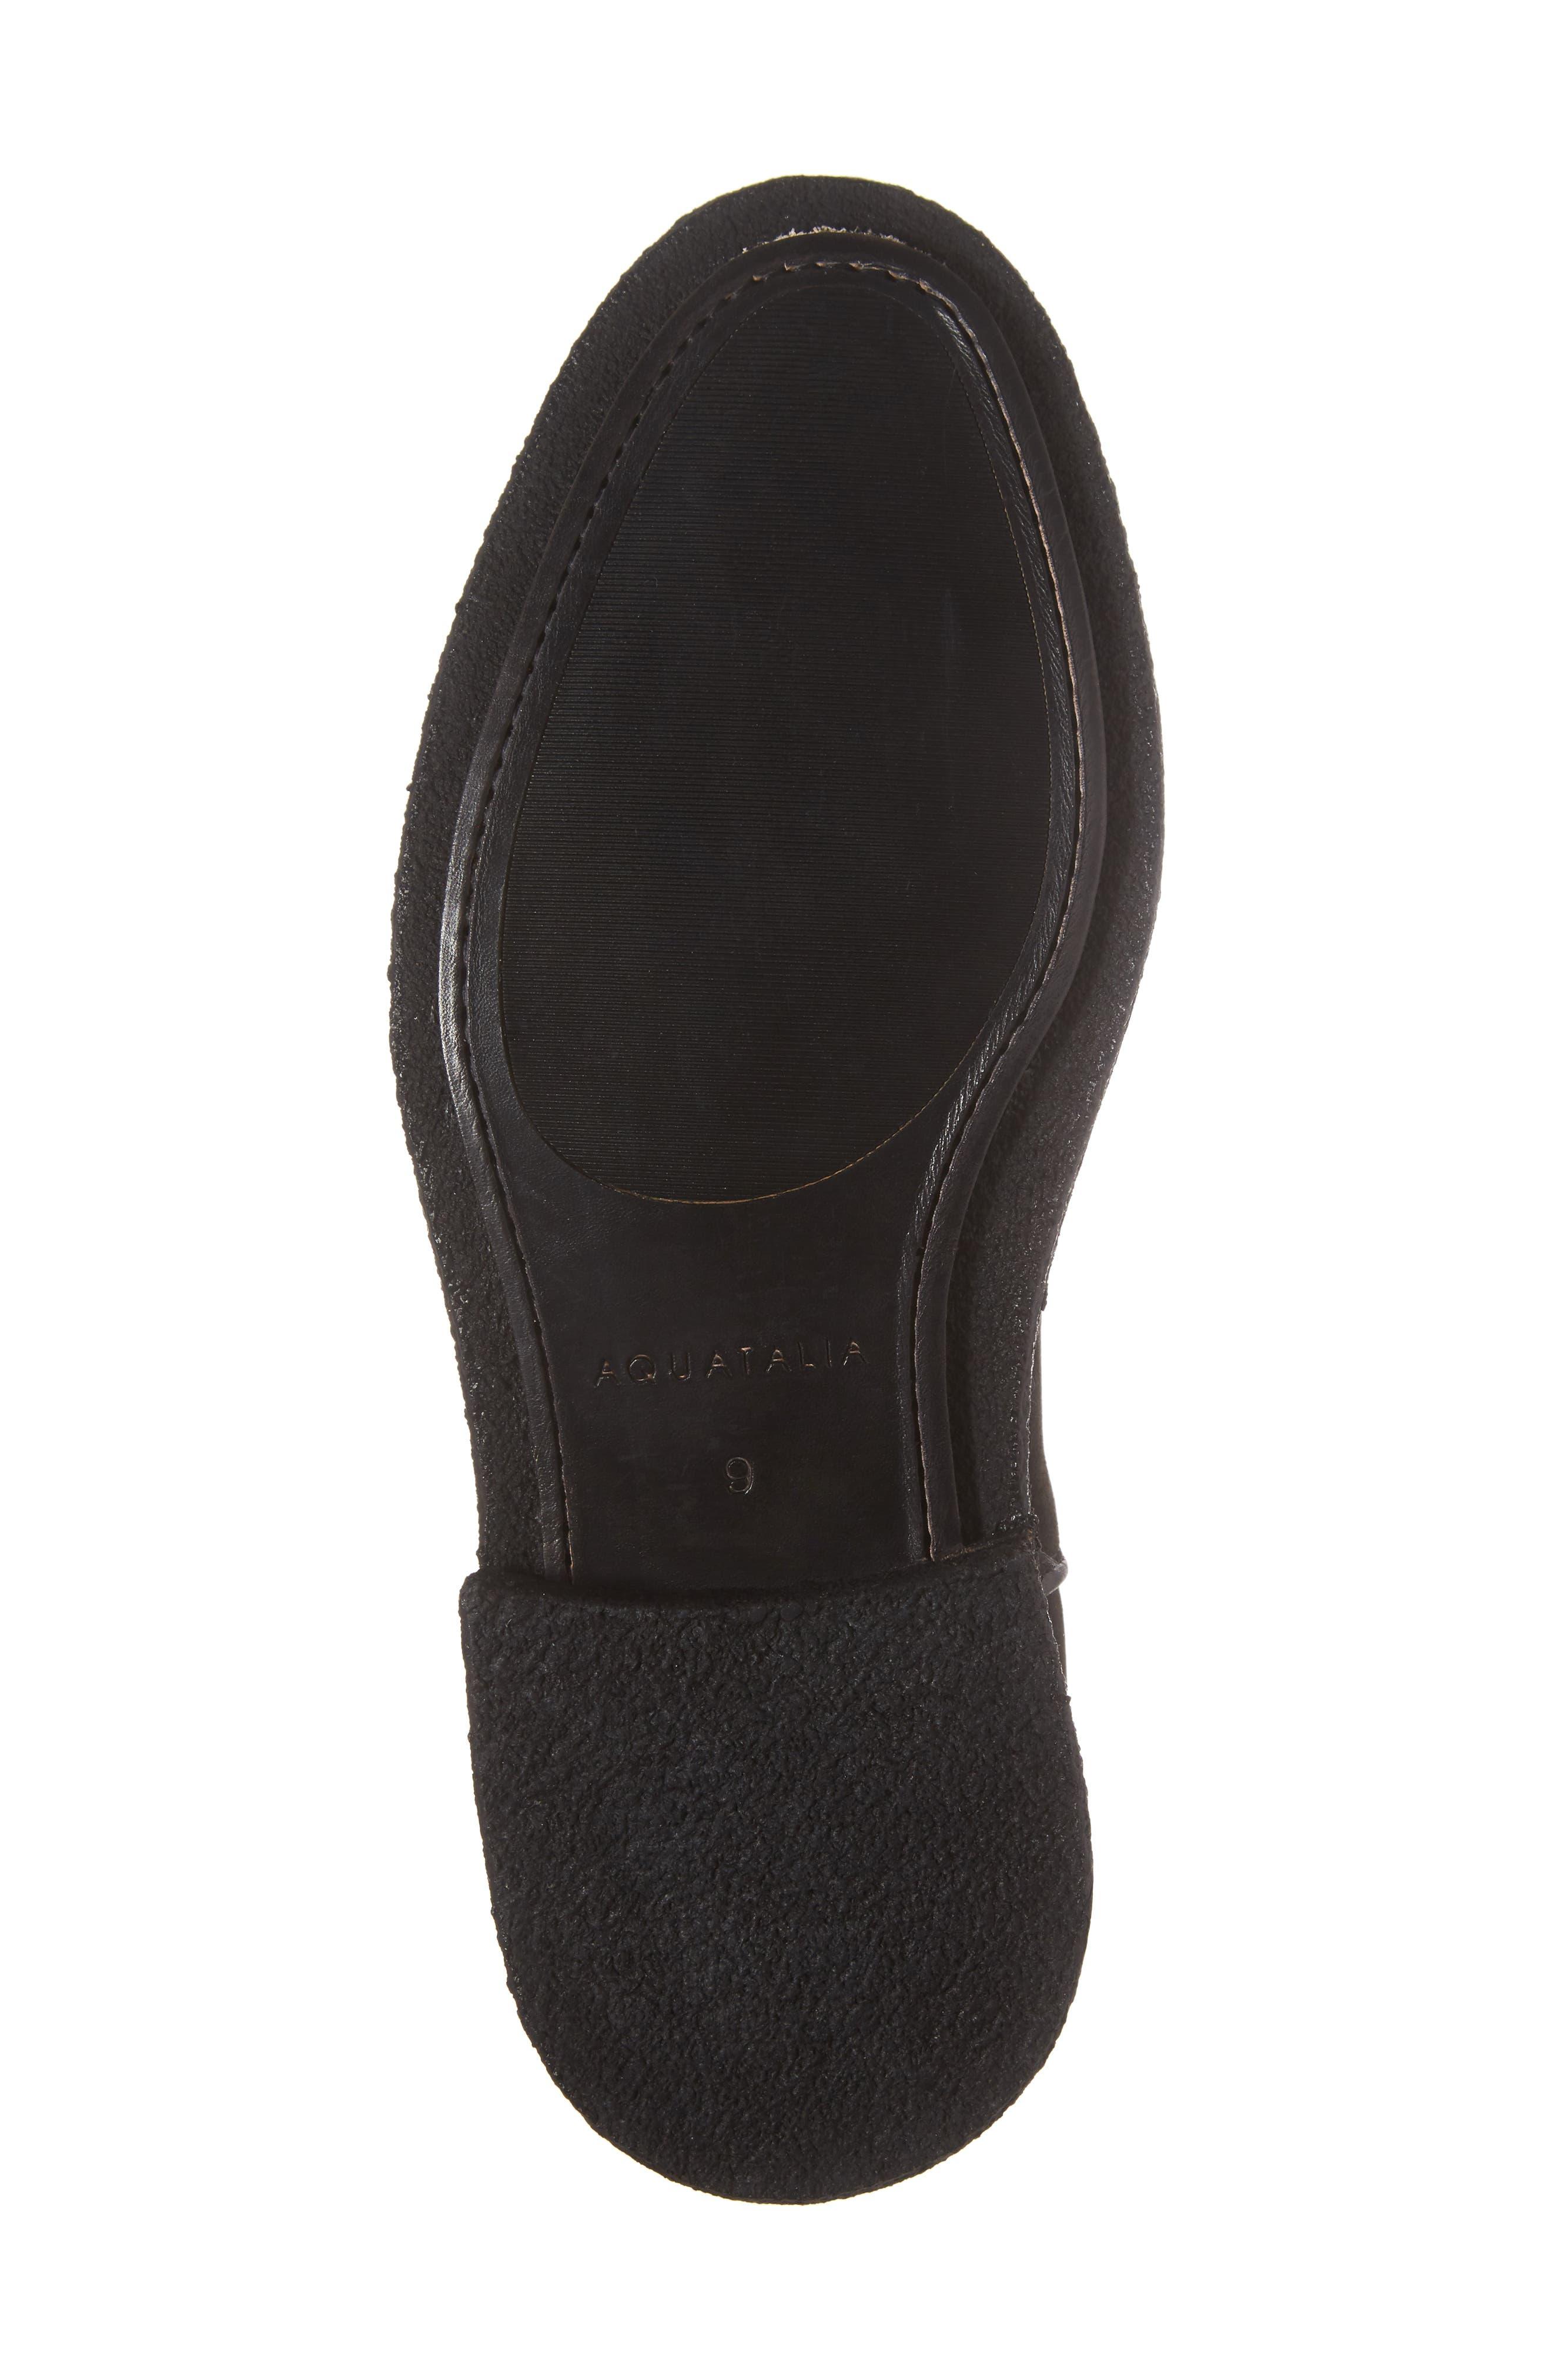 Oscar Chelsea Boot,                             Alternate thumbnail 6, color,                             020